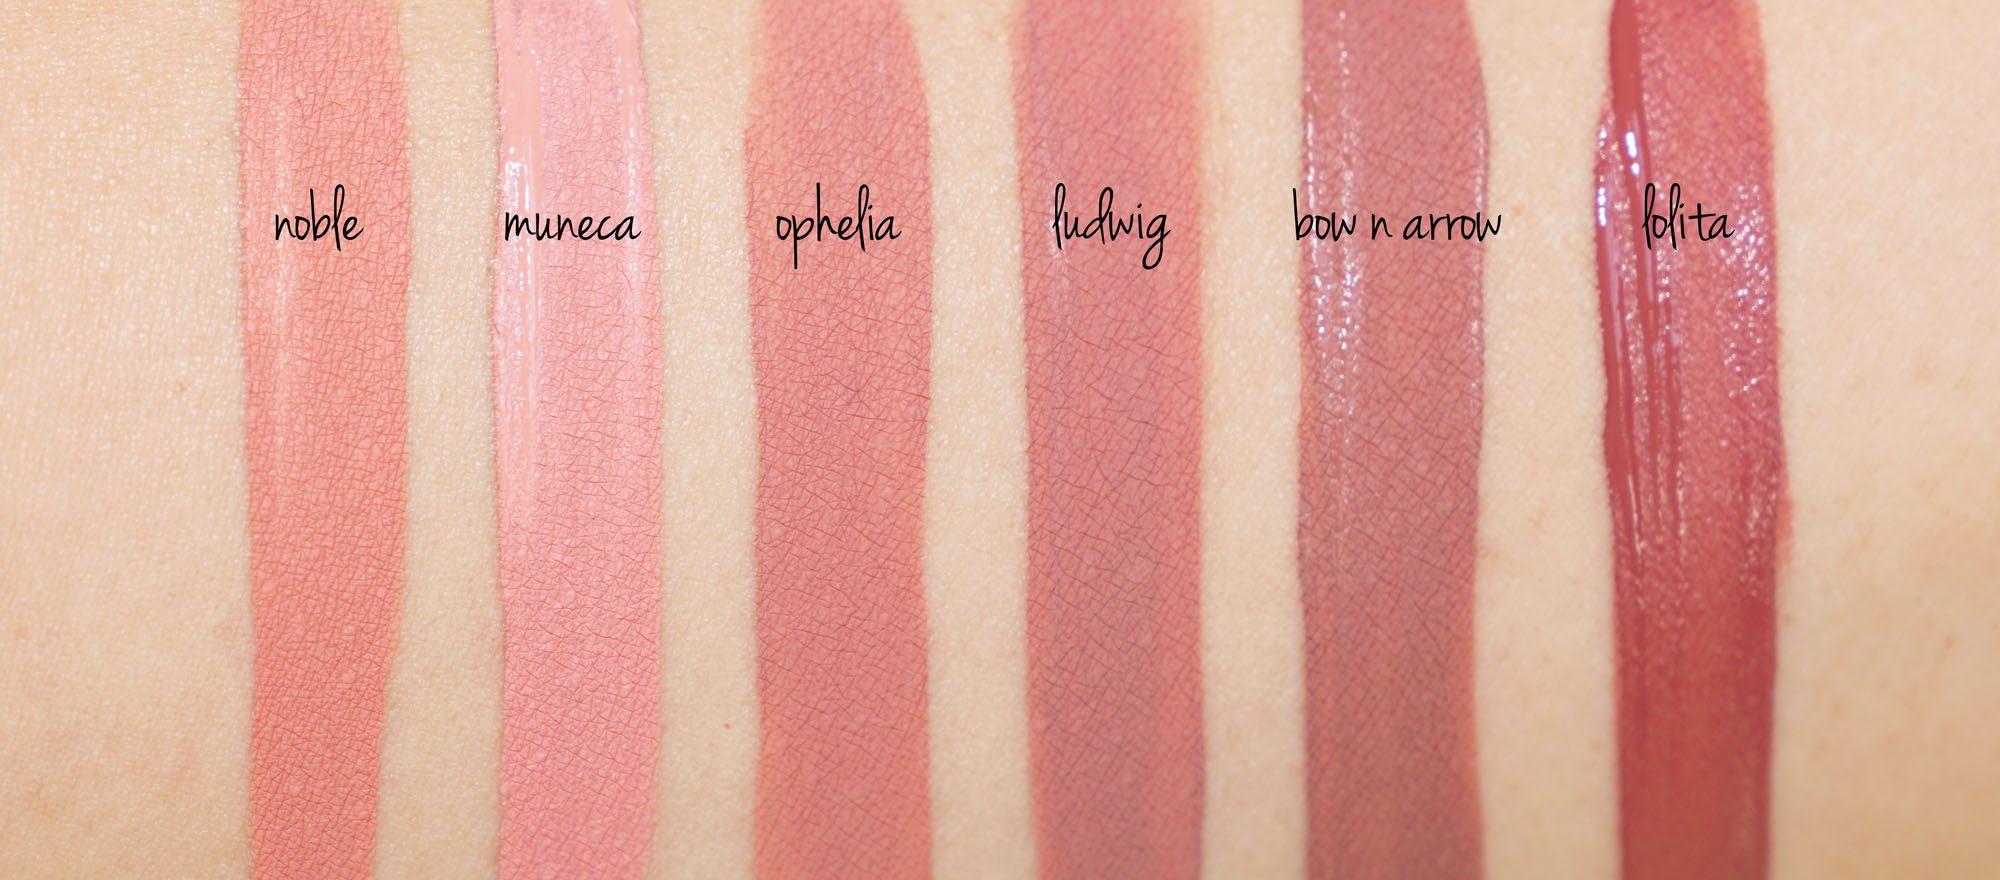 ... Kat Von D Everlasting Liquid Lipstick Nudes | The Beauty Look Book